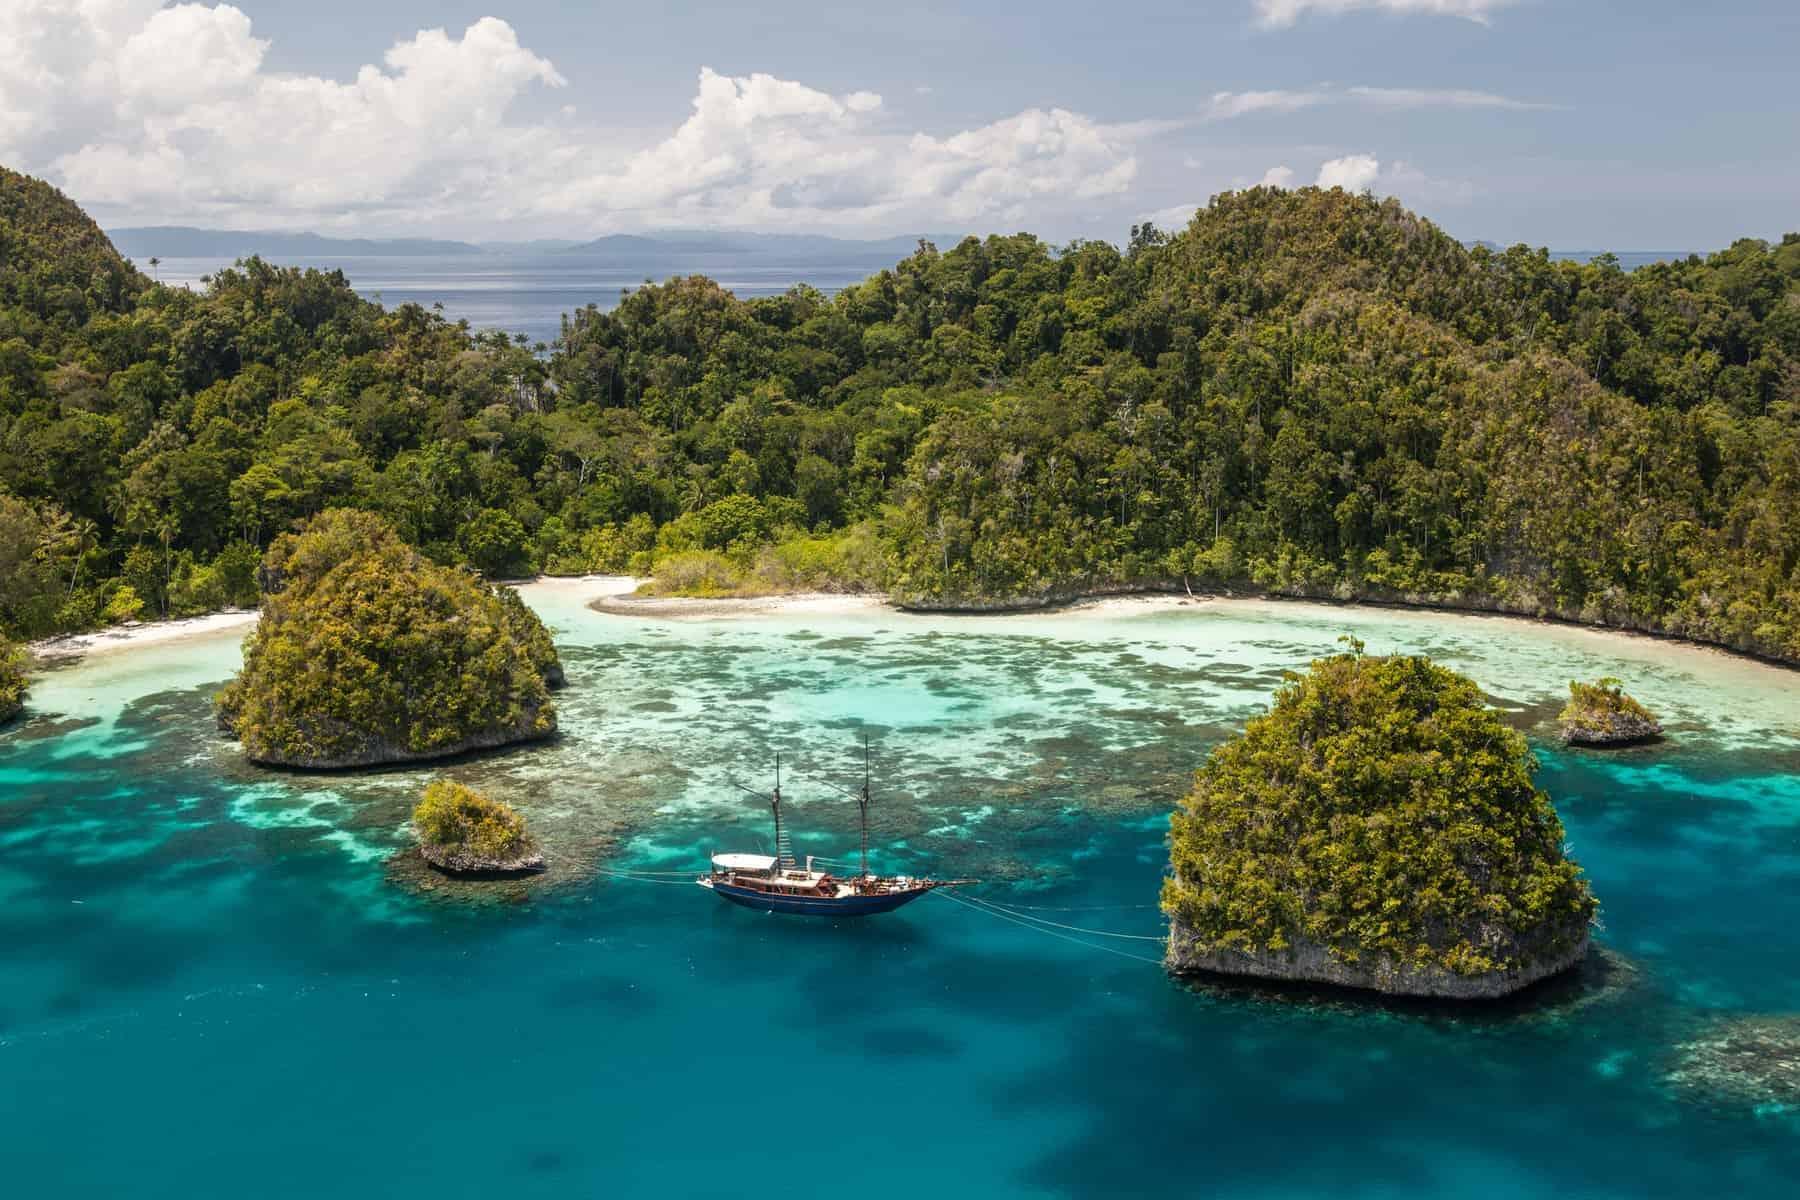 Papua New Guinea, Raja Ampat med kalkholdige og smukke øer